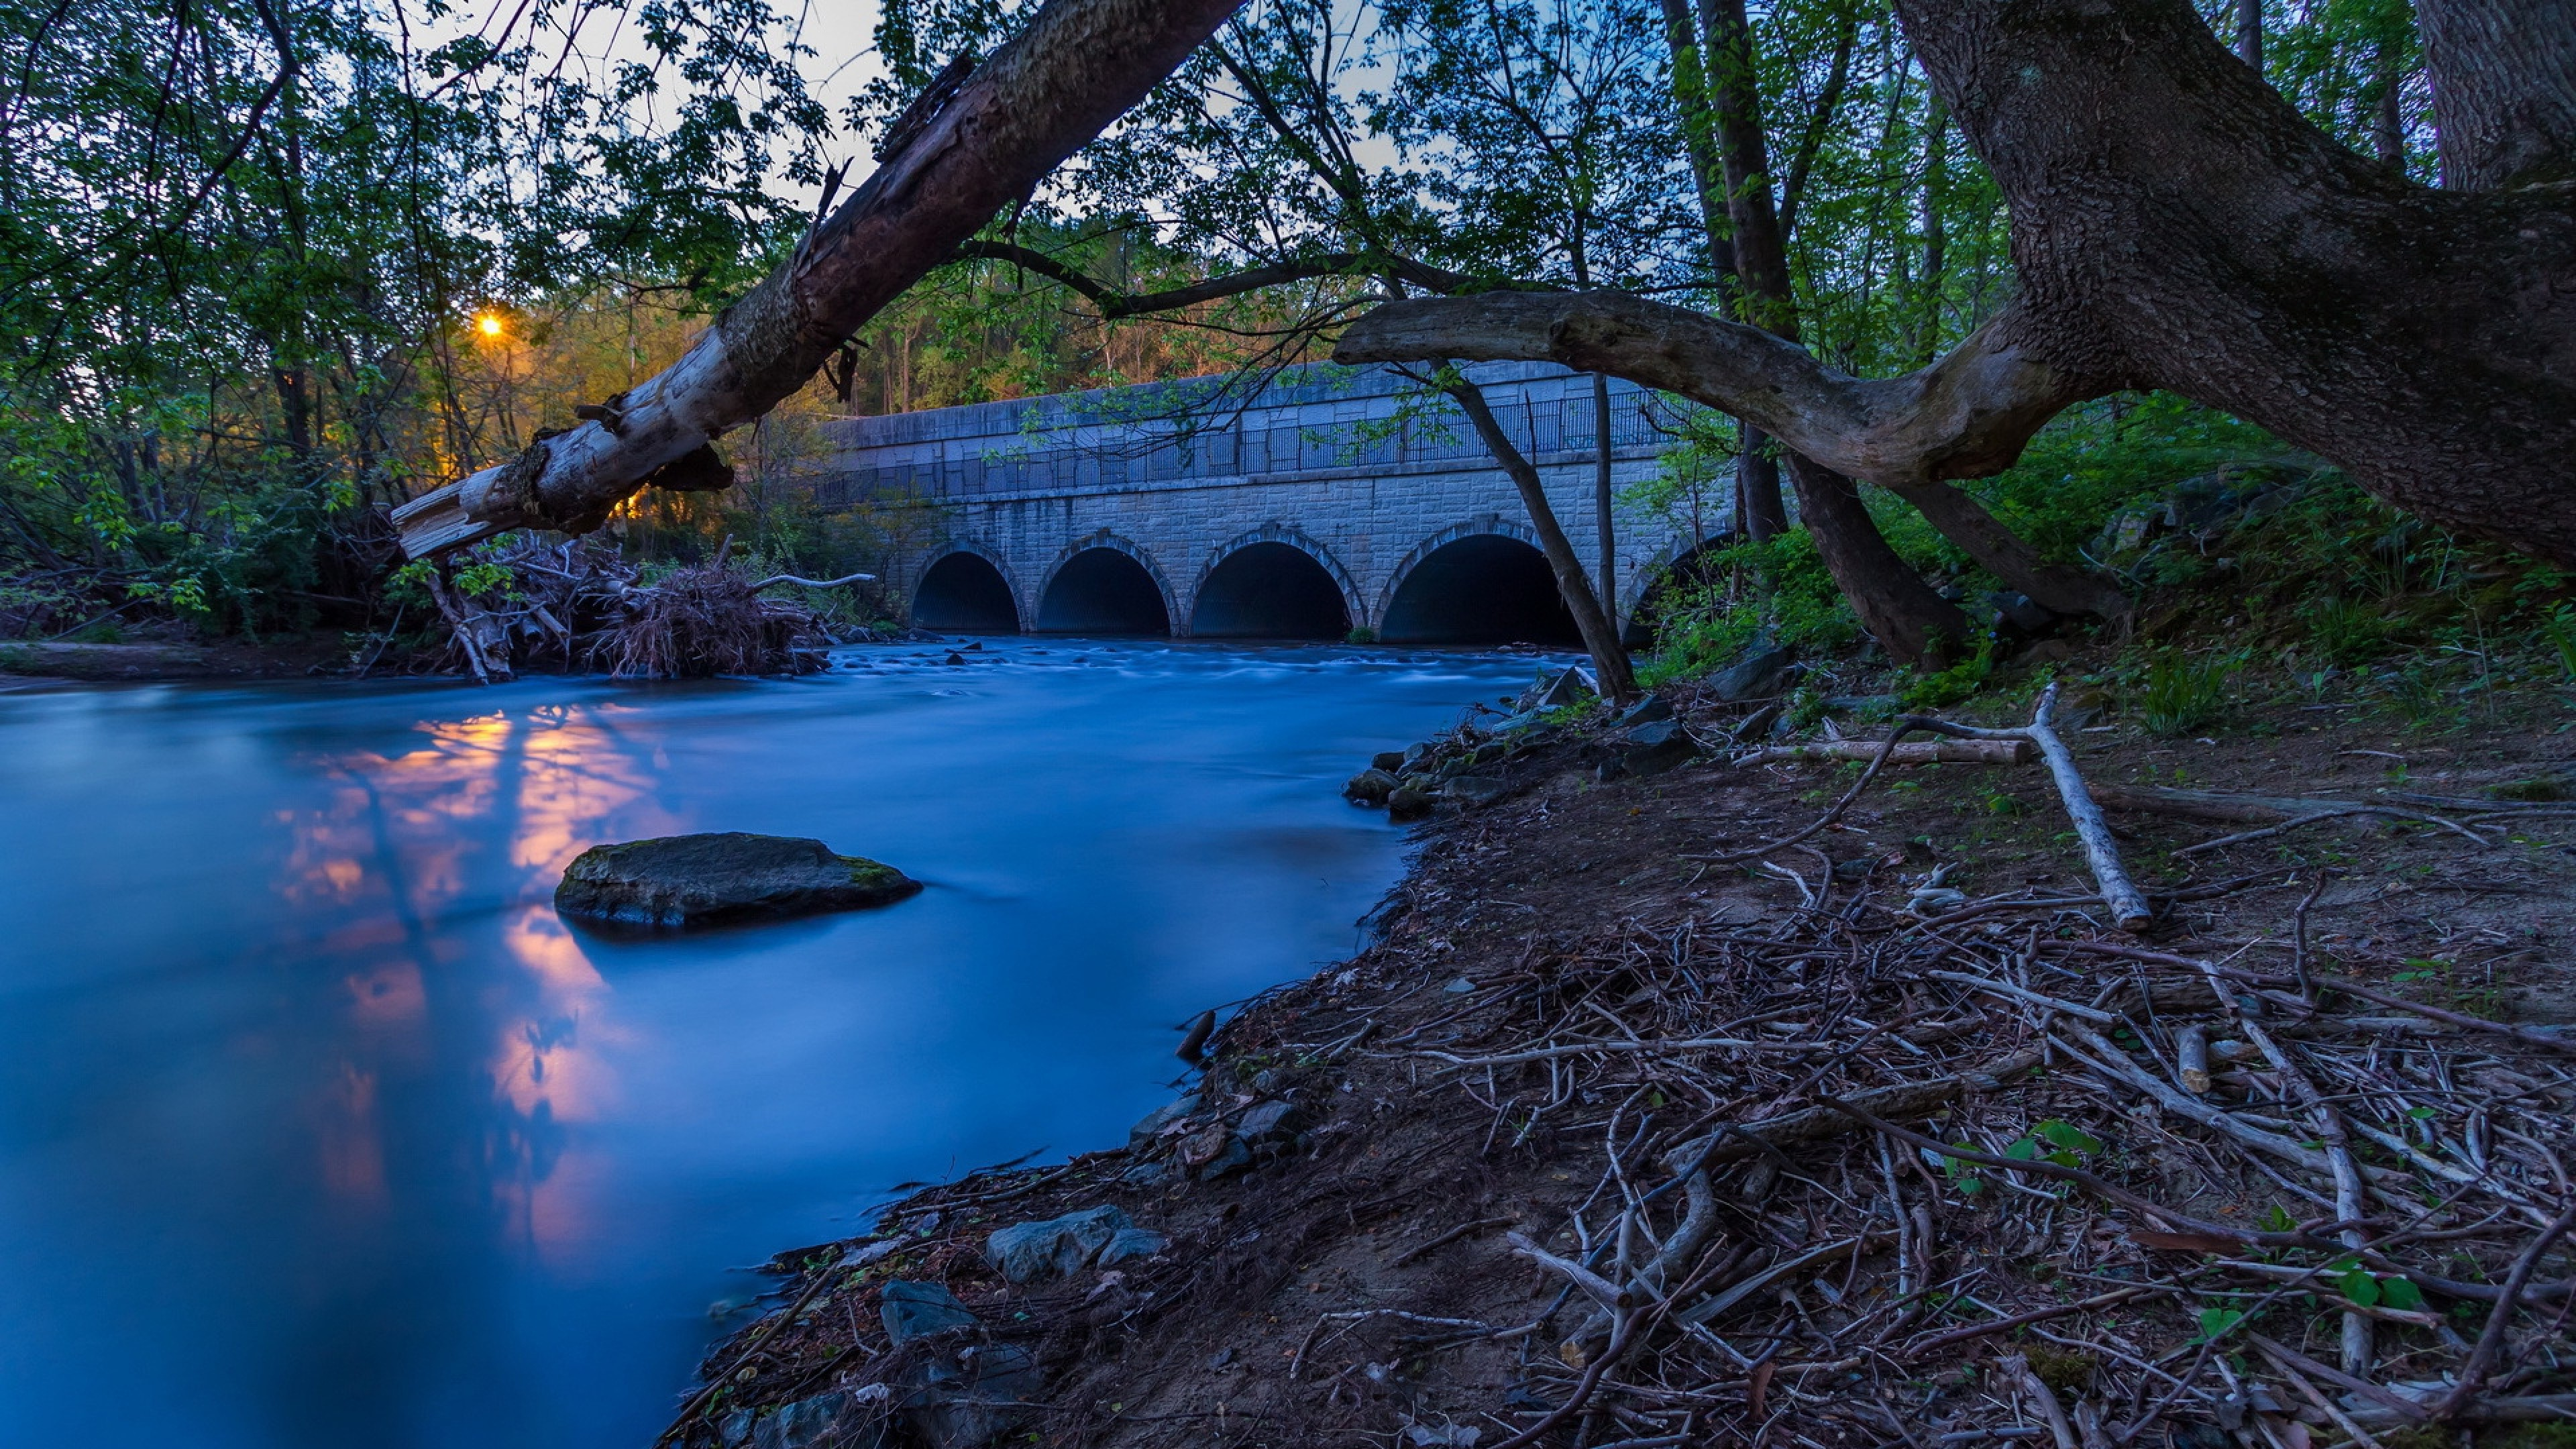 Download Wallpaper 1920x1080 River Sunset Bridge: Park River Bridge Sunset, HD Nature, 4k Wallpapers, Images